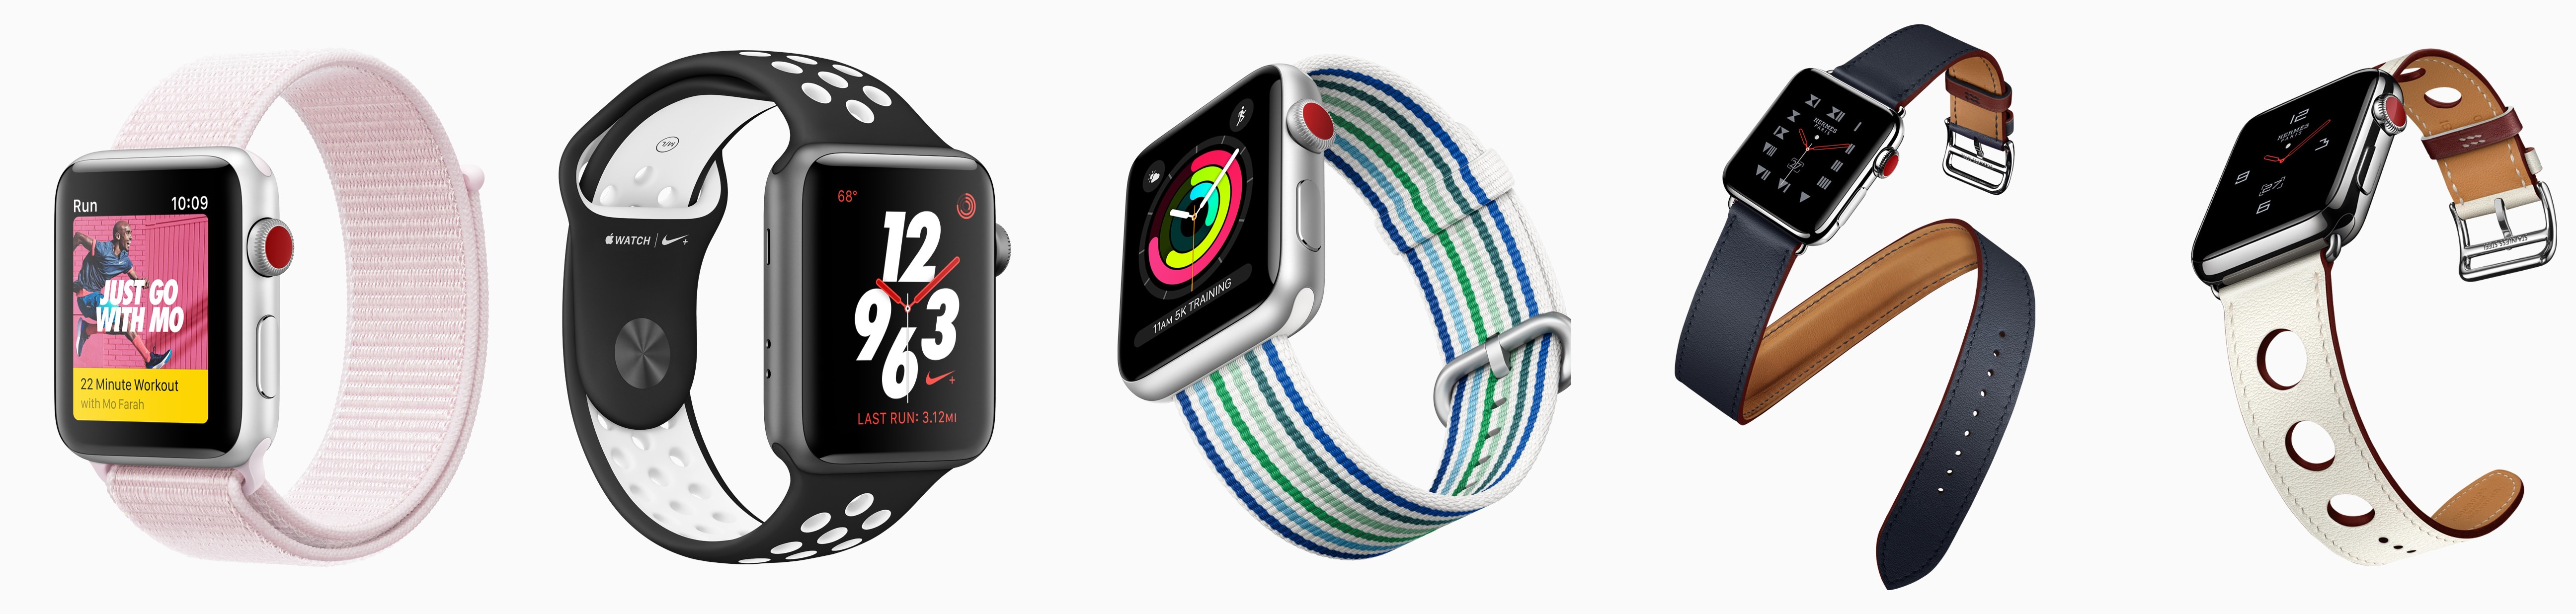 Die Frühlingskollektion neuer Apple-Watch-Armbänder